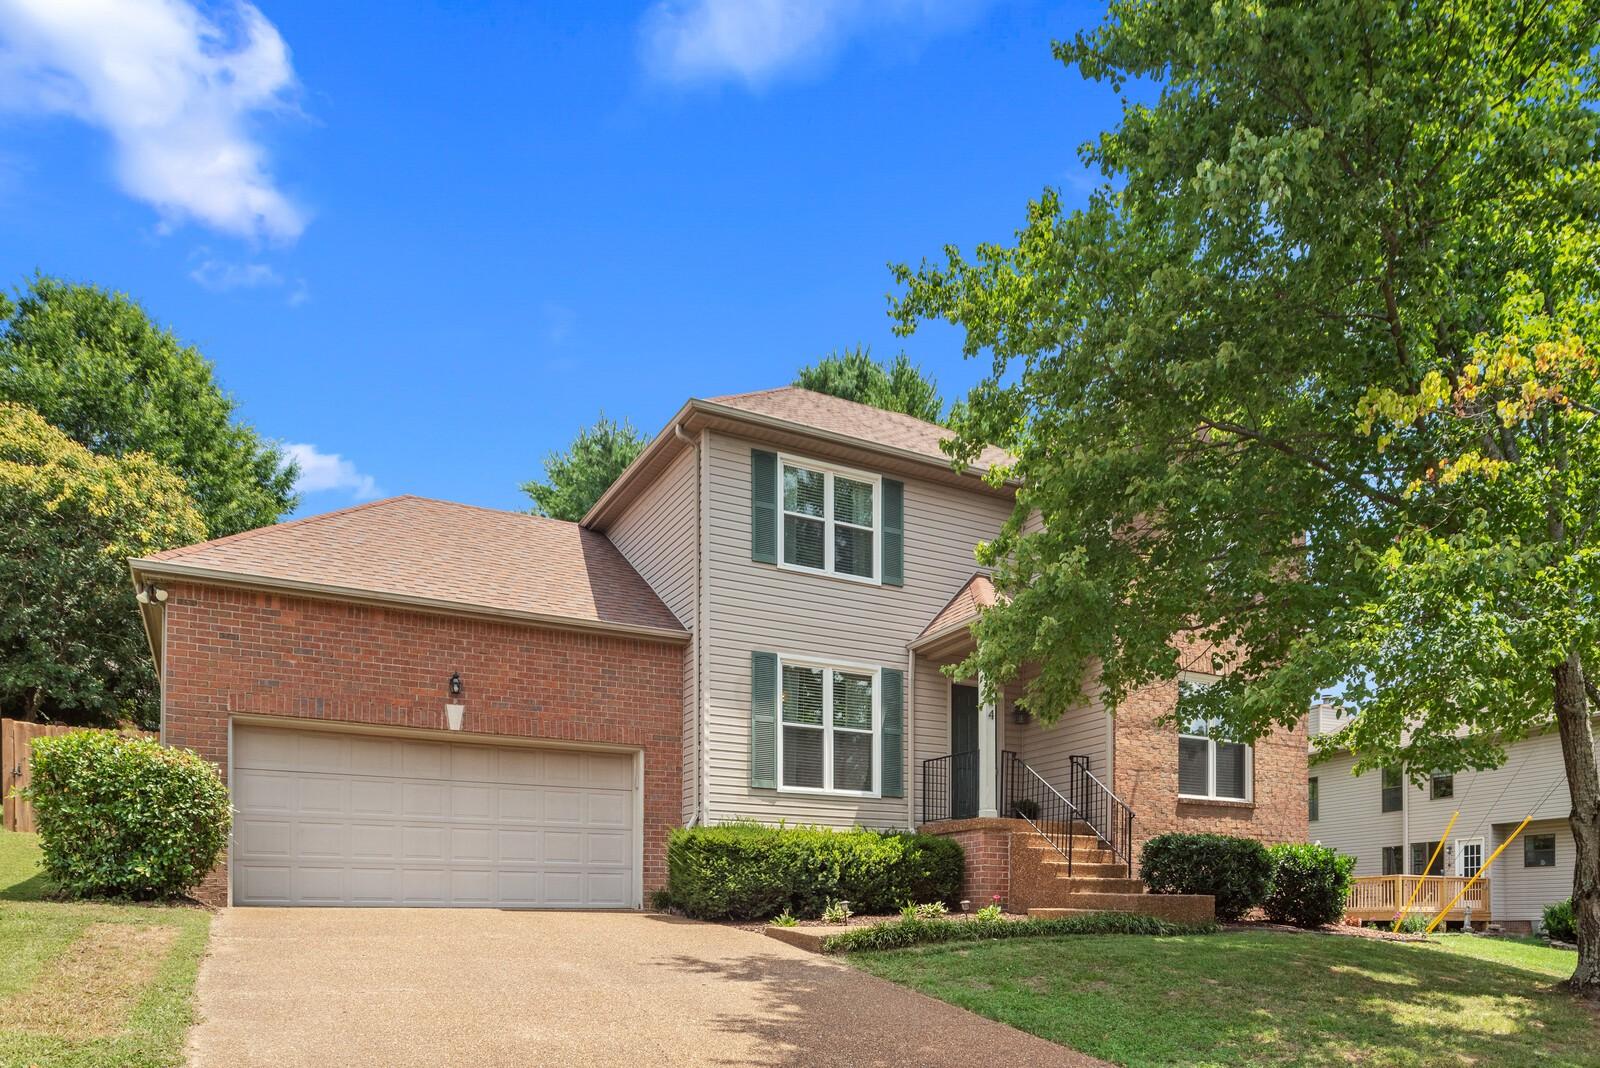 224 Burgandy Hill Rd Property Photo - Nashville, TN real estate listing